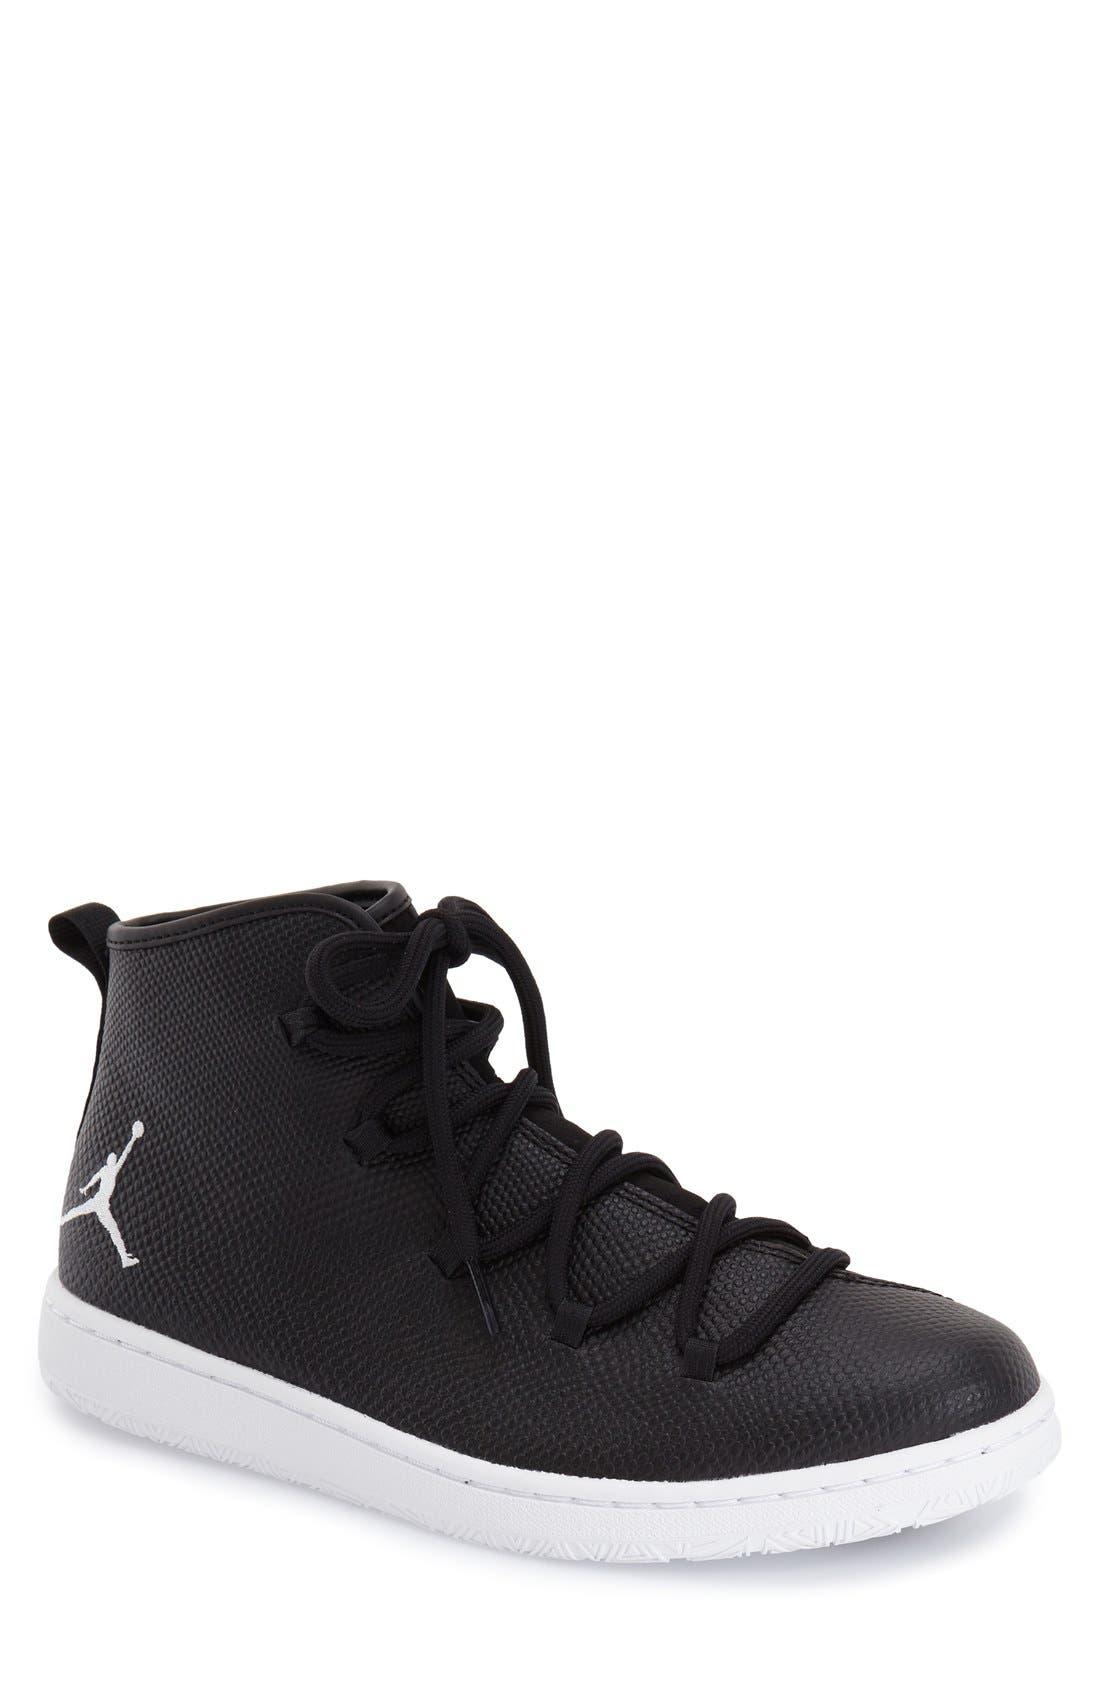 Jordan Galaxy' Sneaker, Main, color, 010